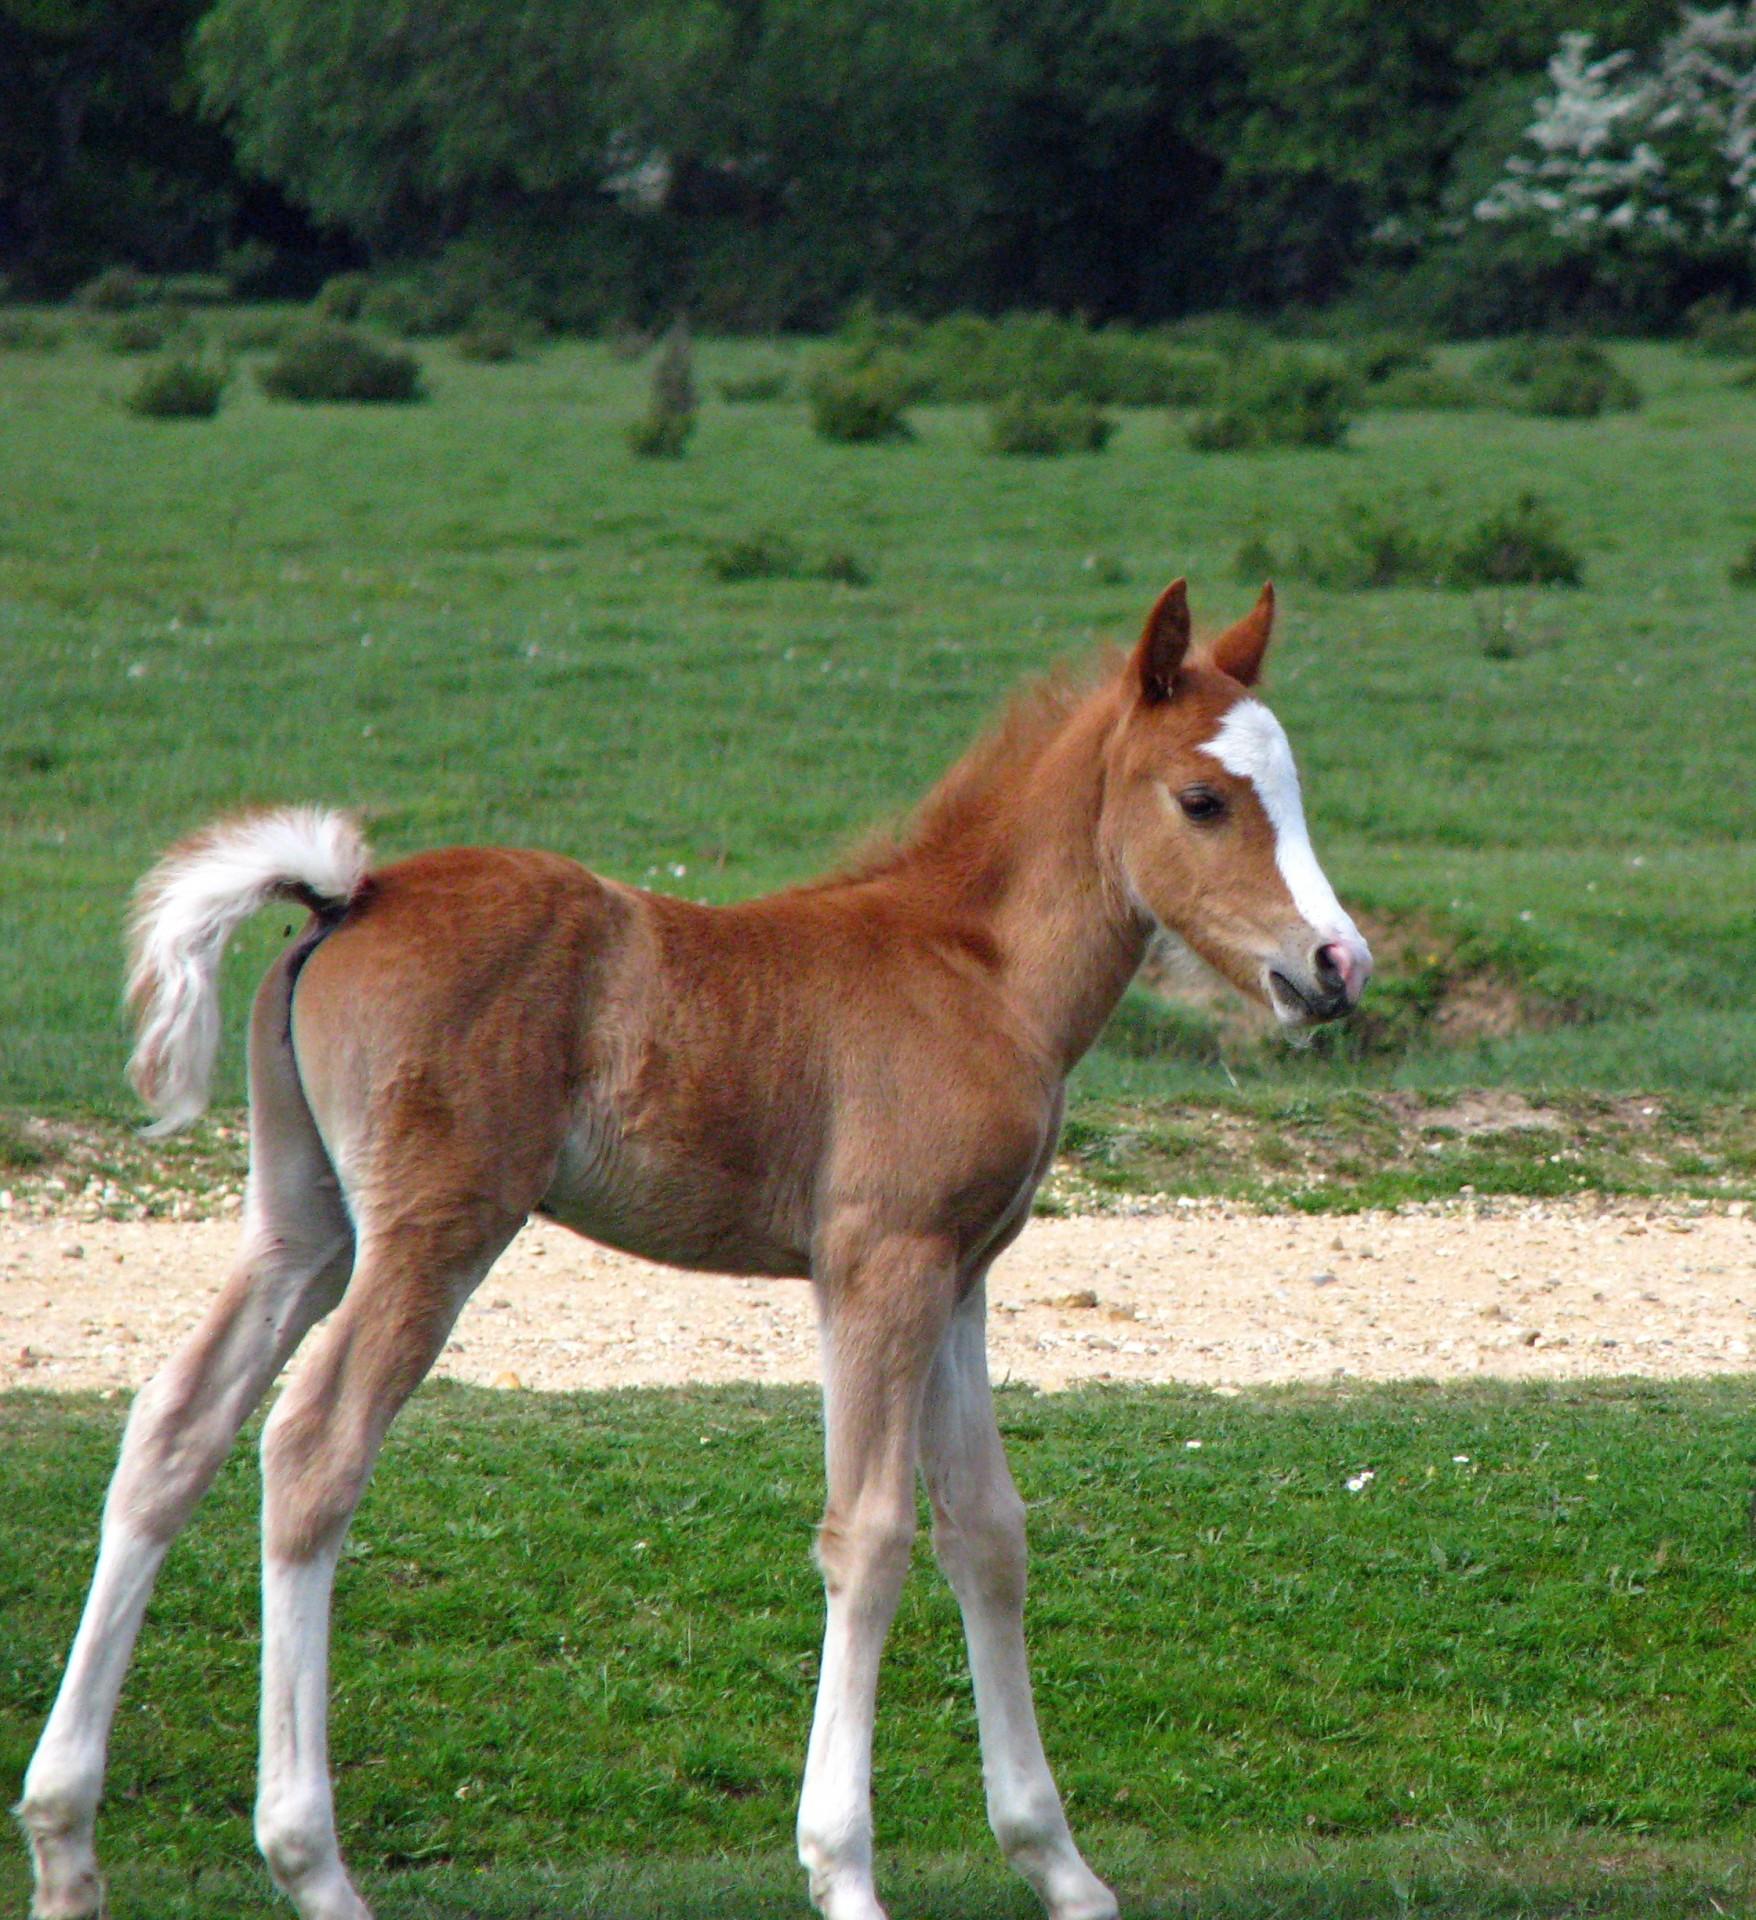 Foal Horse Equine Colt Cute Free Image From Needpix Com